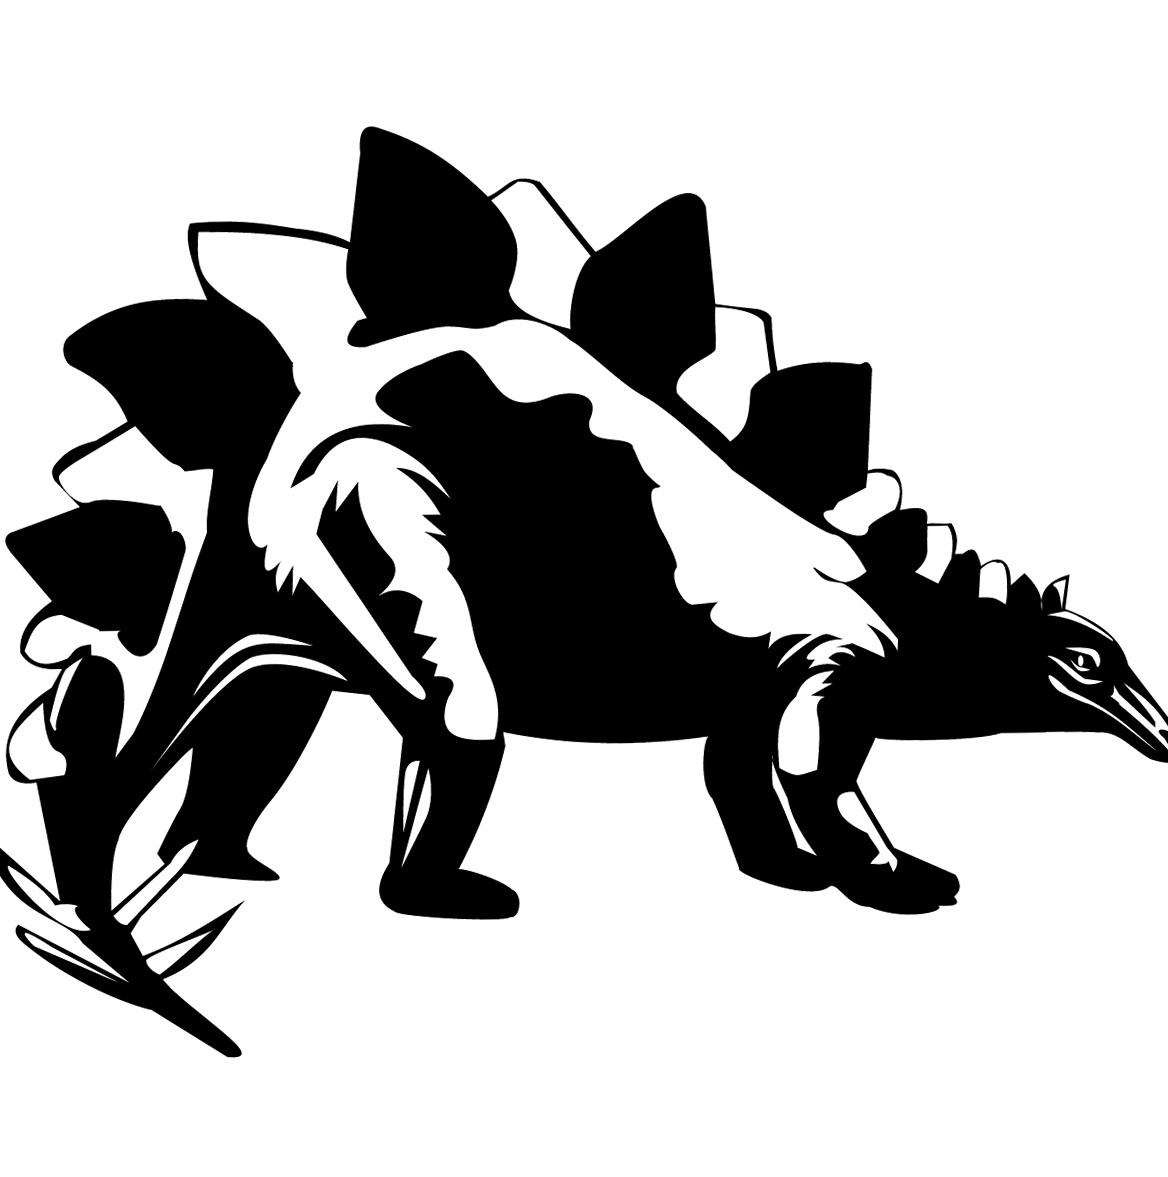 Dinosaur Wall Art Uk